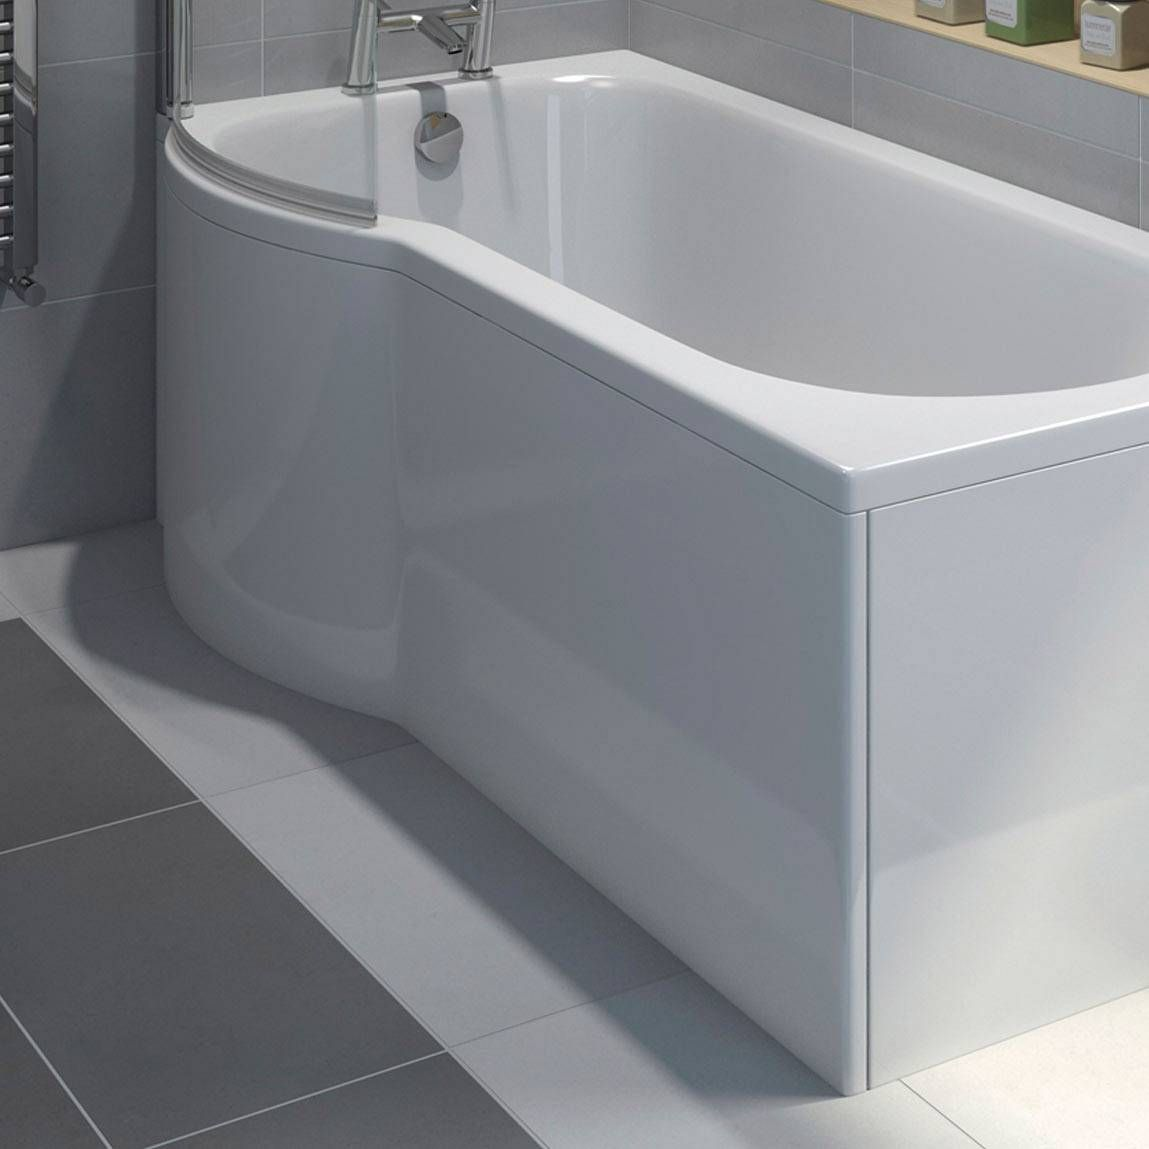 Evesham 1675 Bath Front Panel Now 59 99 Shower Bath Bath Front Panel Bath Panel